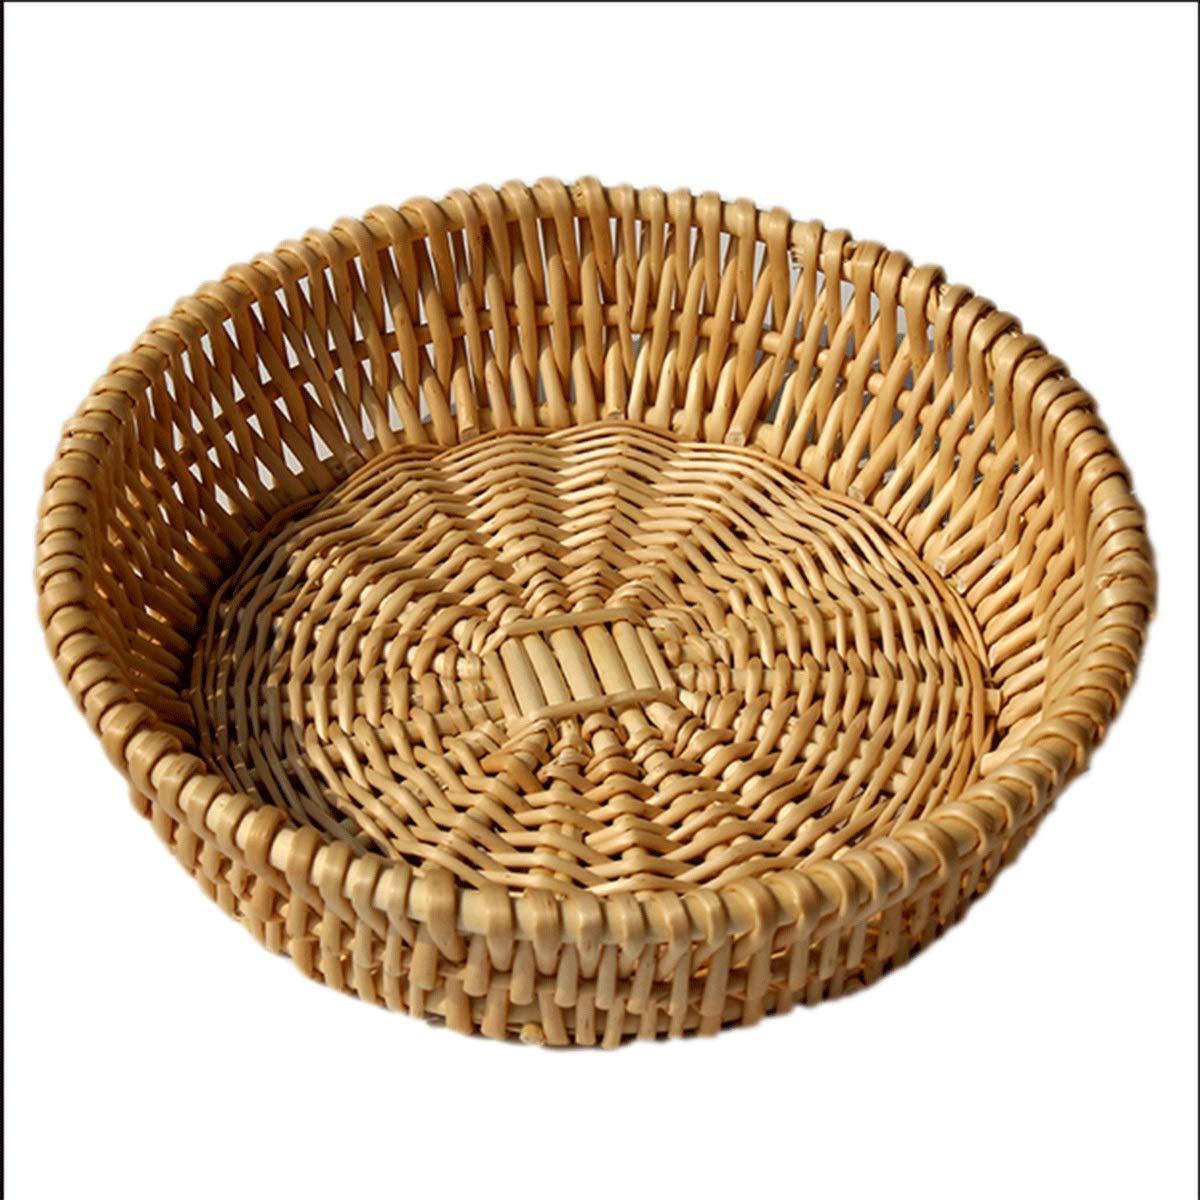 Muziwenju Rattan Basket, Wicker Basket, Kitchen Tabletop Toy Weaving Storage Basket, Egg and Fruit Storage Basket, Food Basket, (Size : XXL)